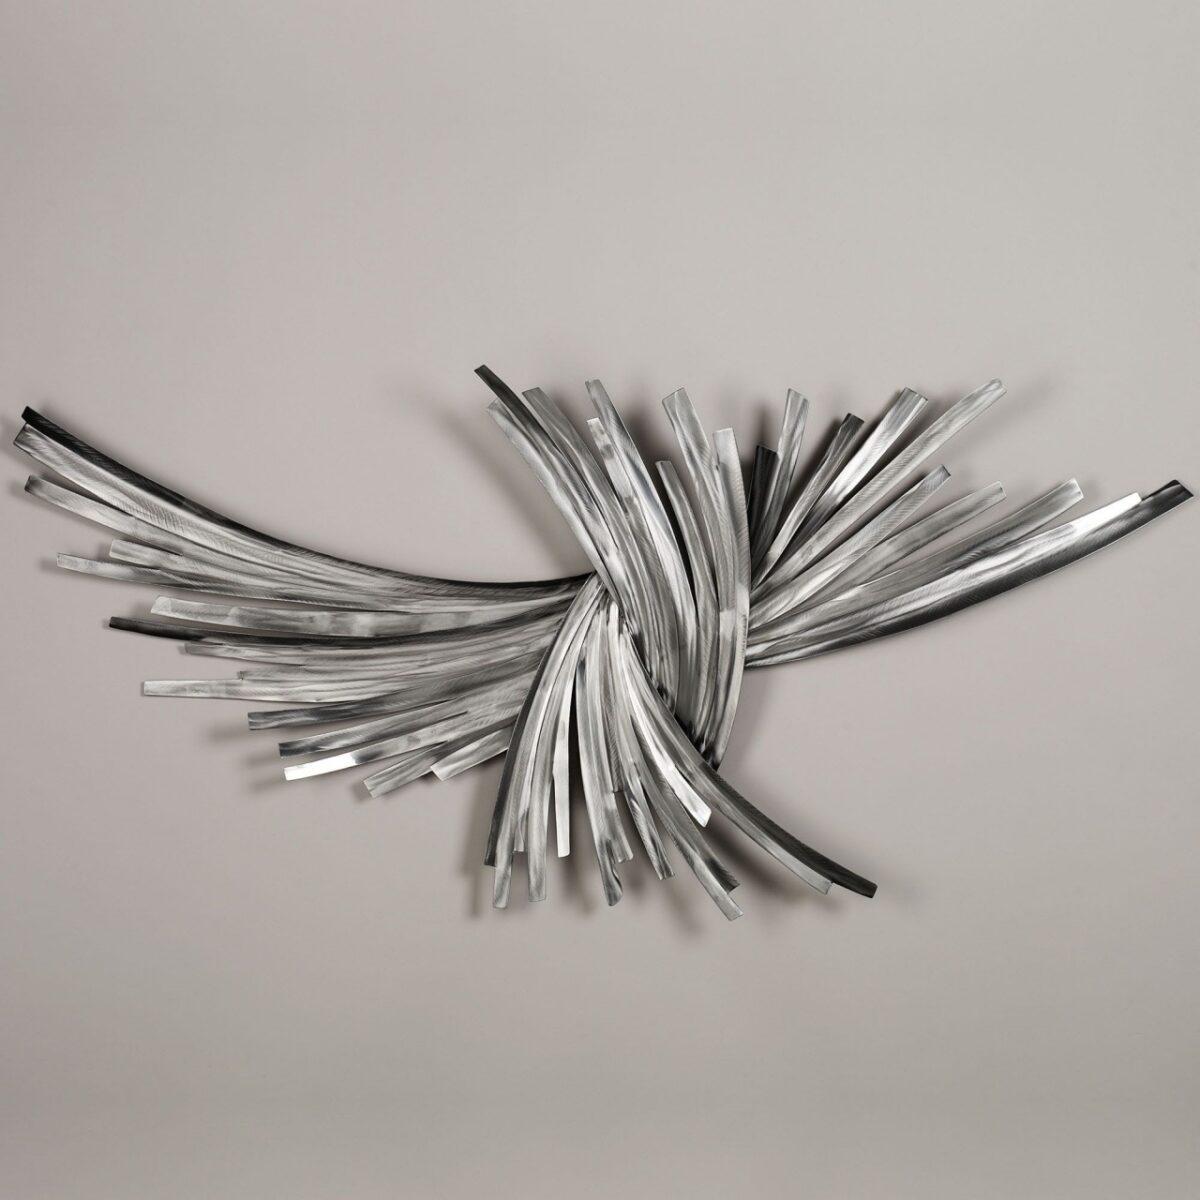 outdoor metal wall art decor sculptures – Infinity Silver Metal Wall Sculpture 壁饰